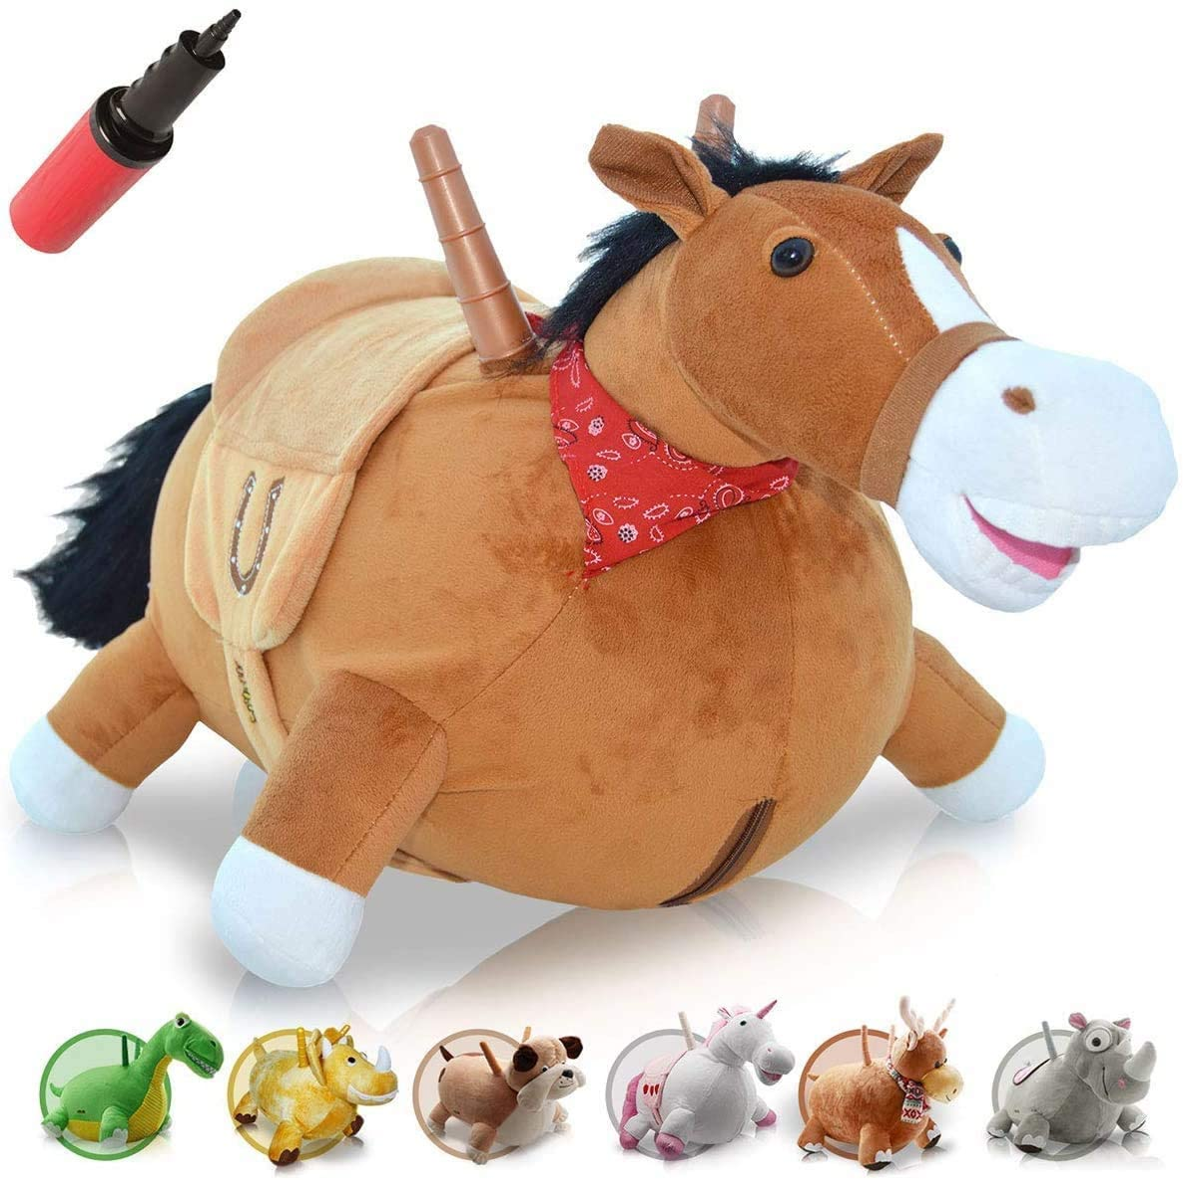 WALIKI Bouncy Horse Hopper | Inflatable Hopping Horse for Kids | Jumping Horse (Bouncy Horse)